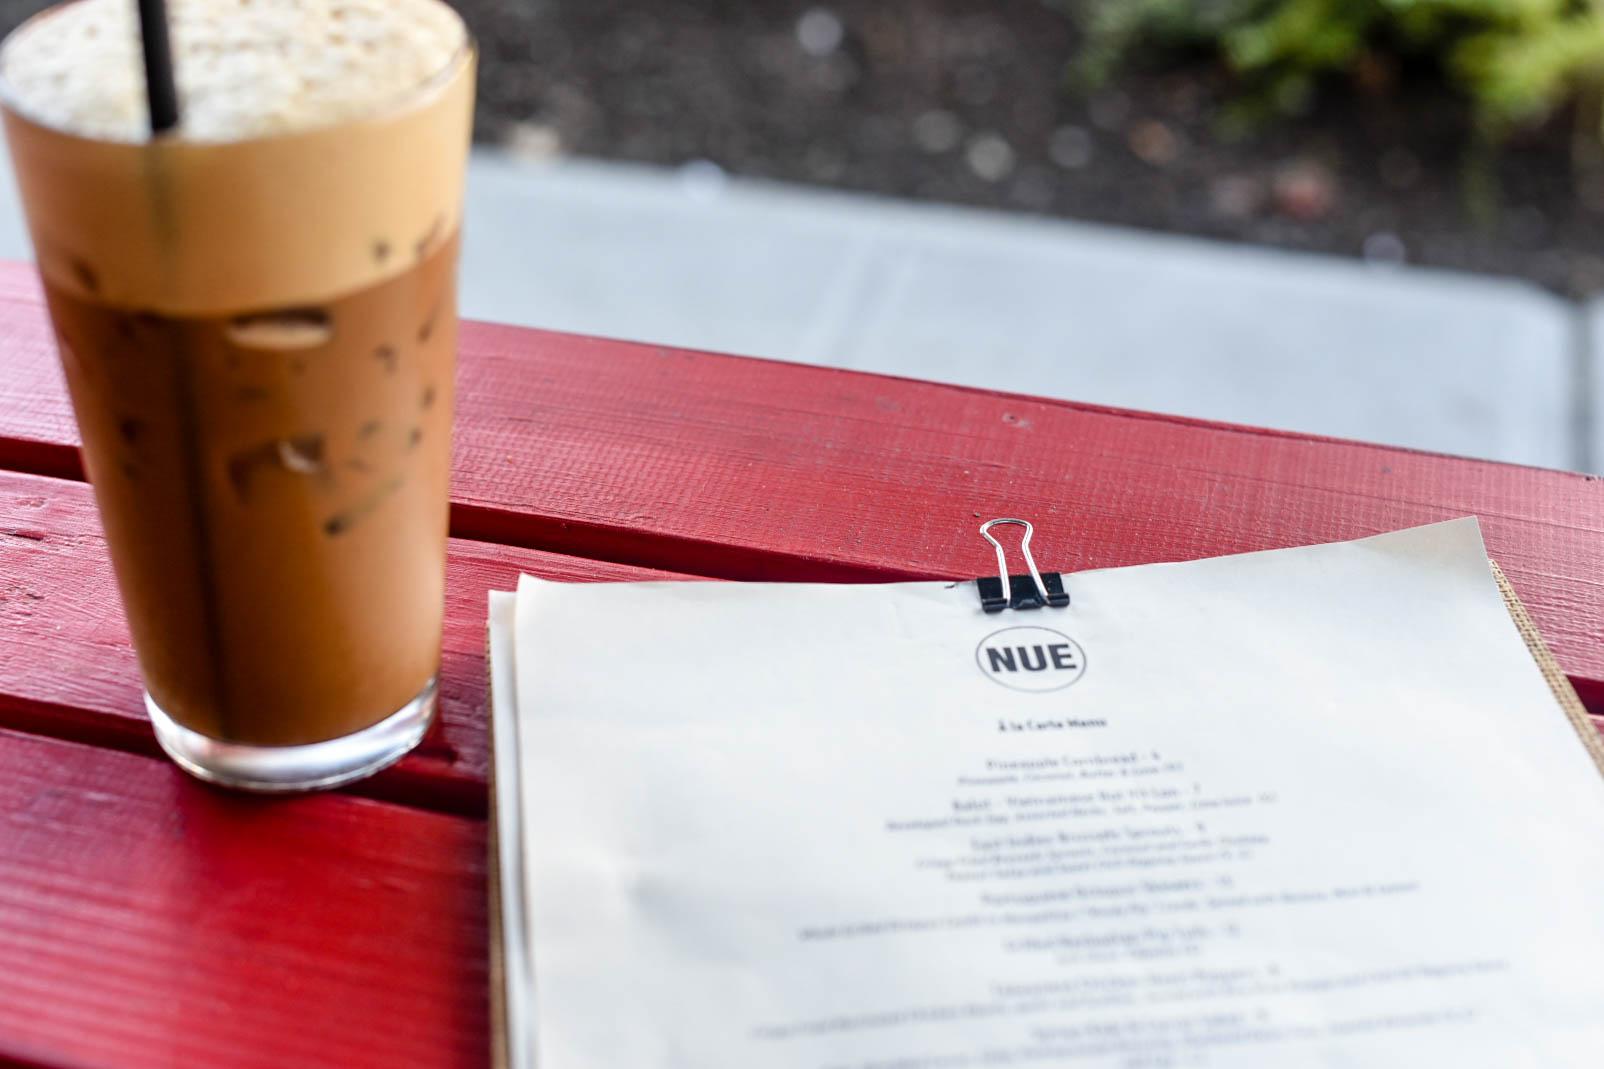 Nue menu and vietnamese iced coffee